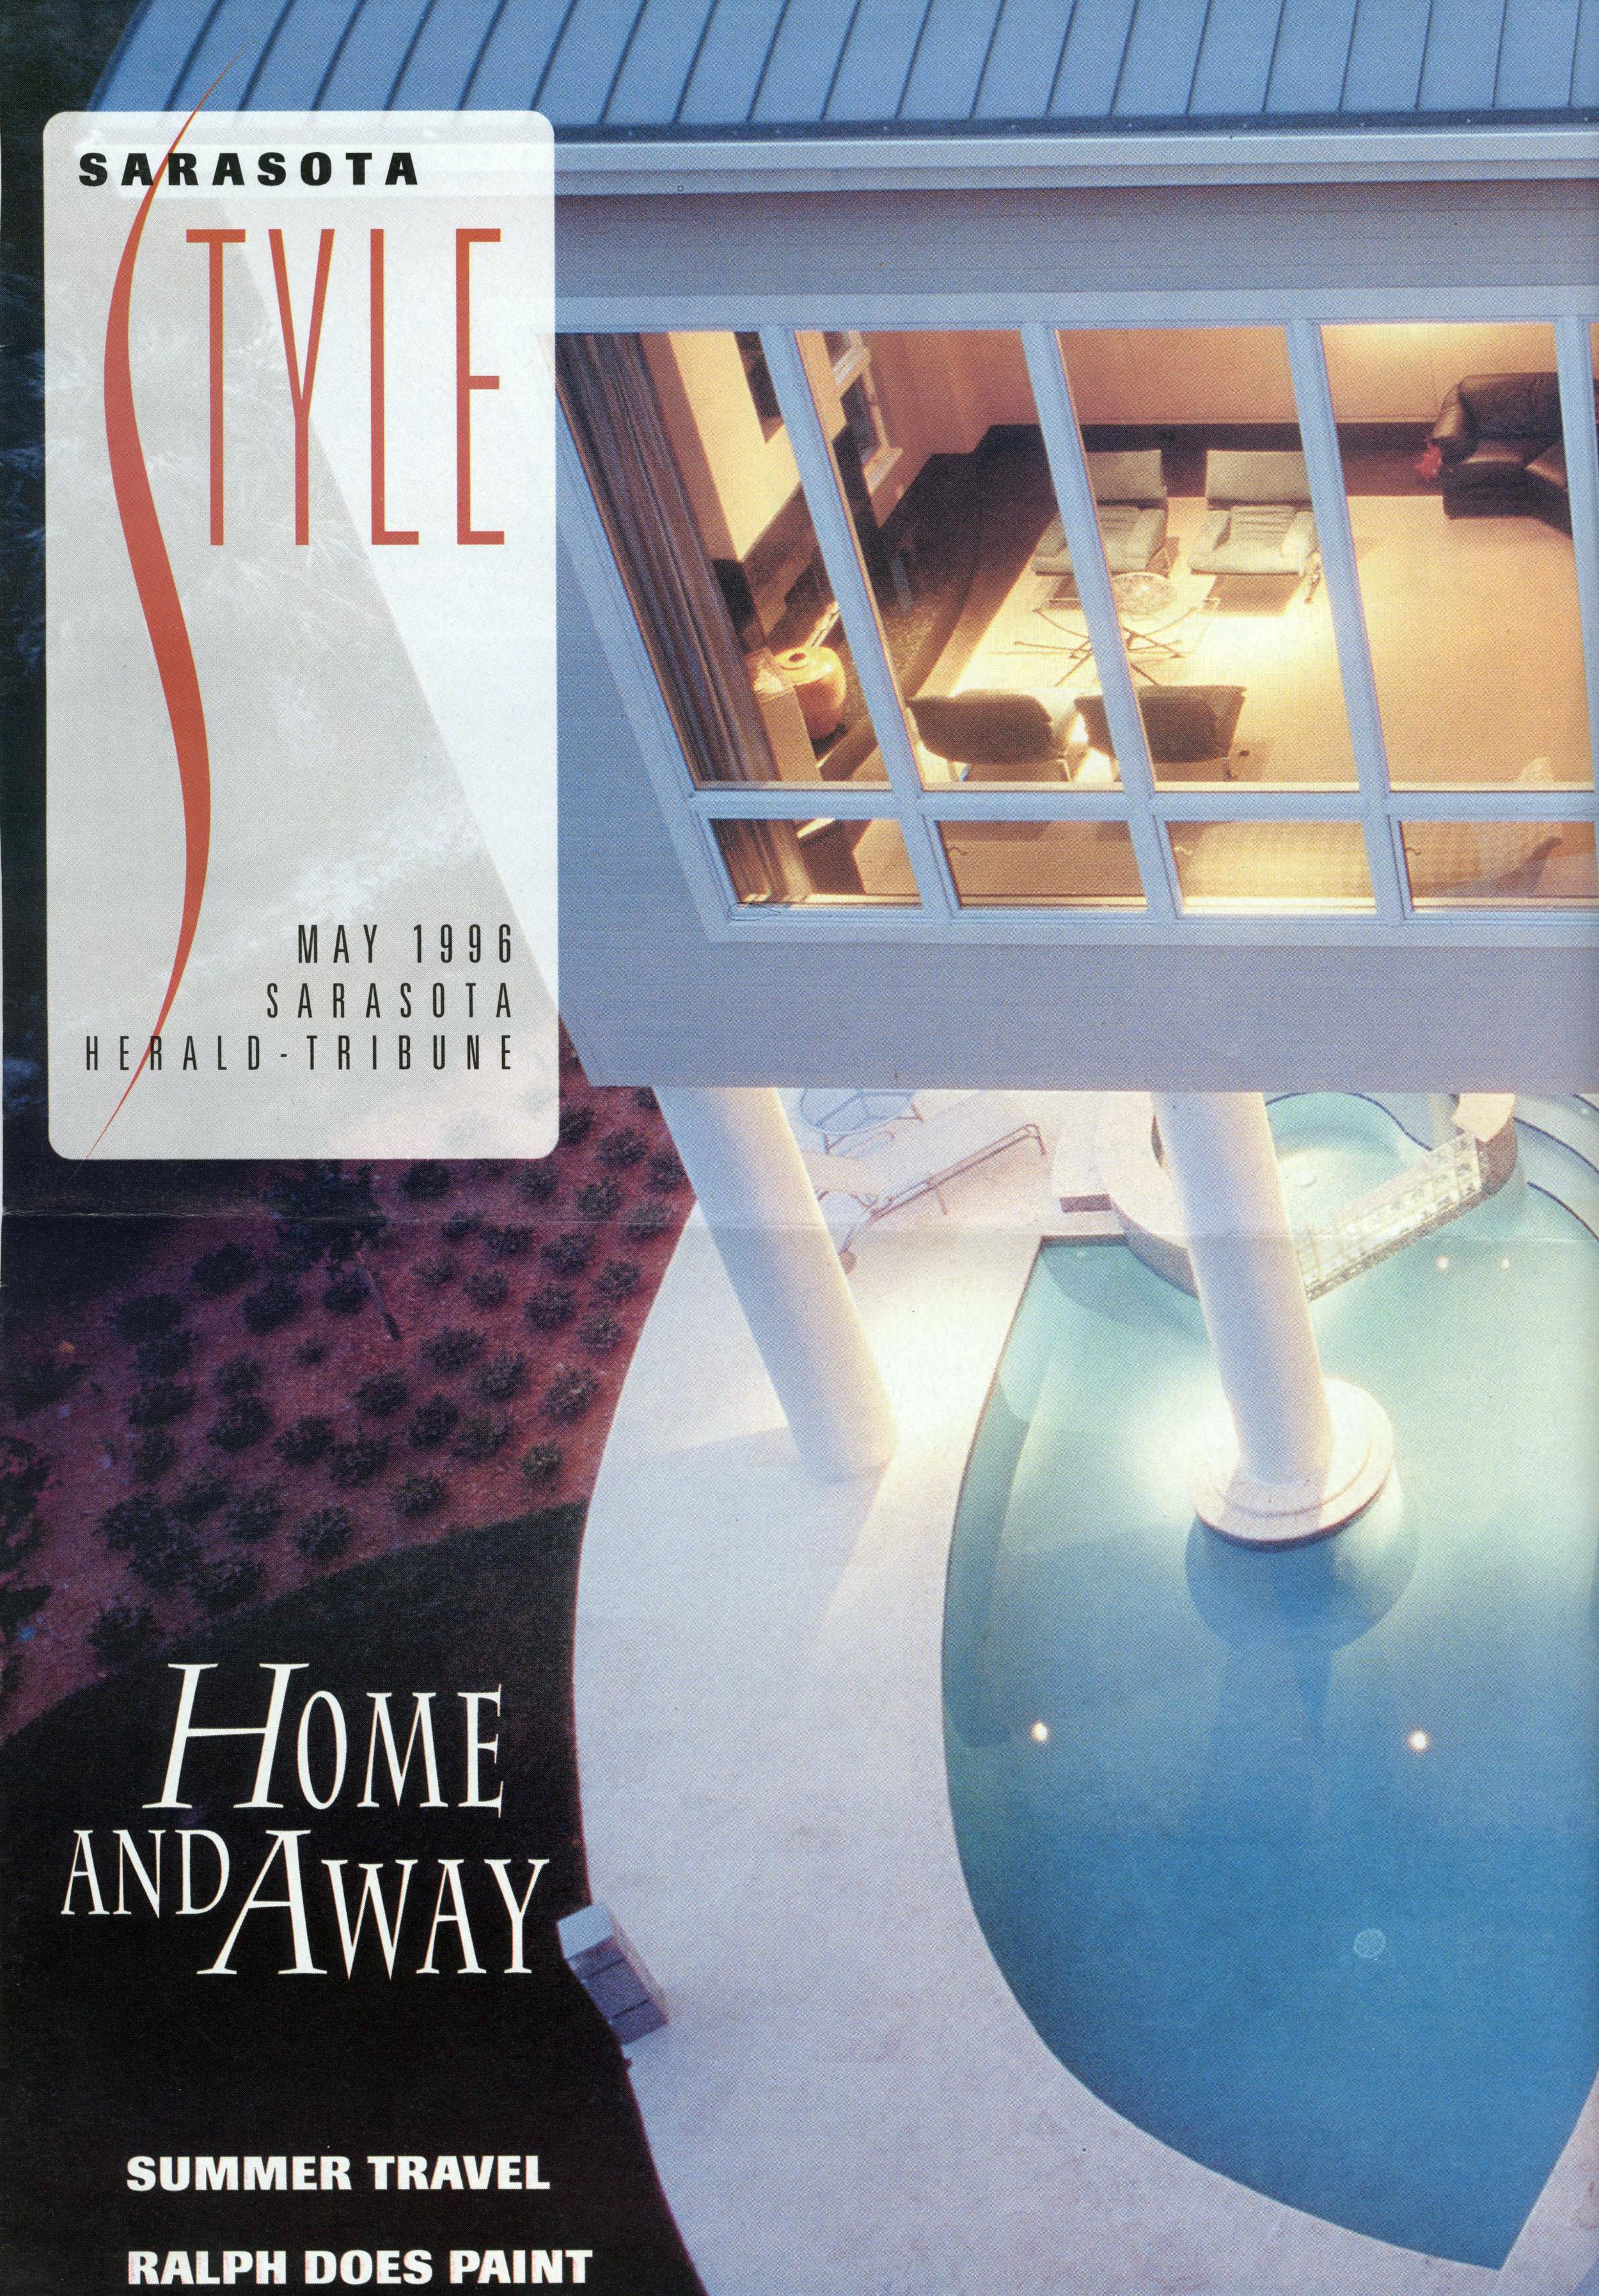 Sarasota Style (Publications) 001 SC-15.jpg